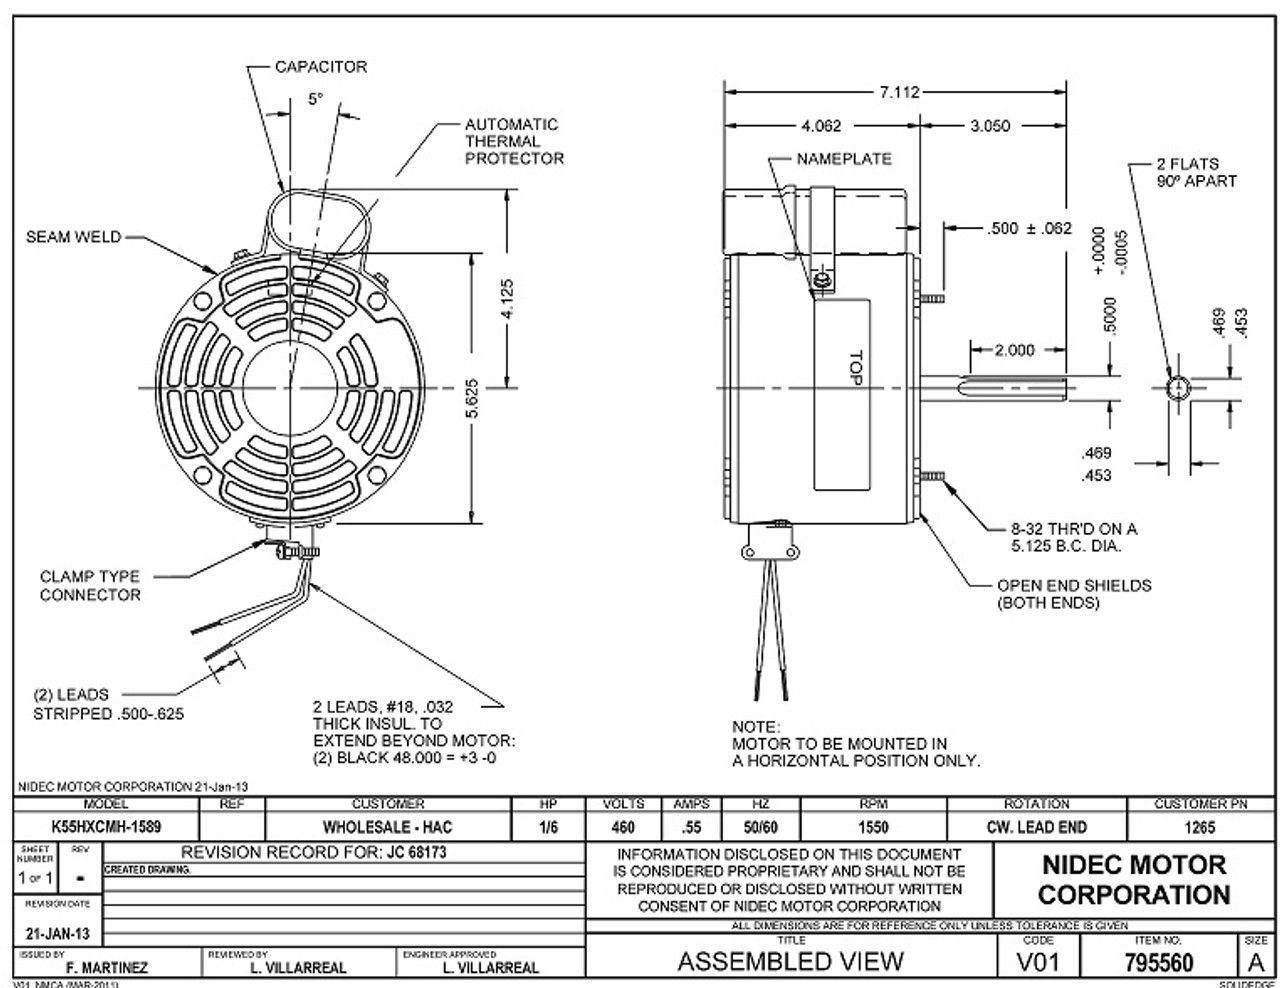 Nidec Condenser Fan Motor Wiring Diagram - All Wiring Diagram on